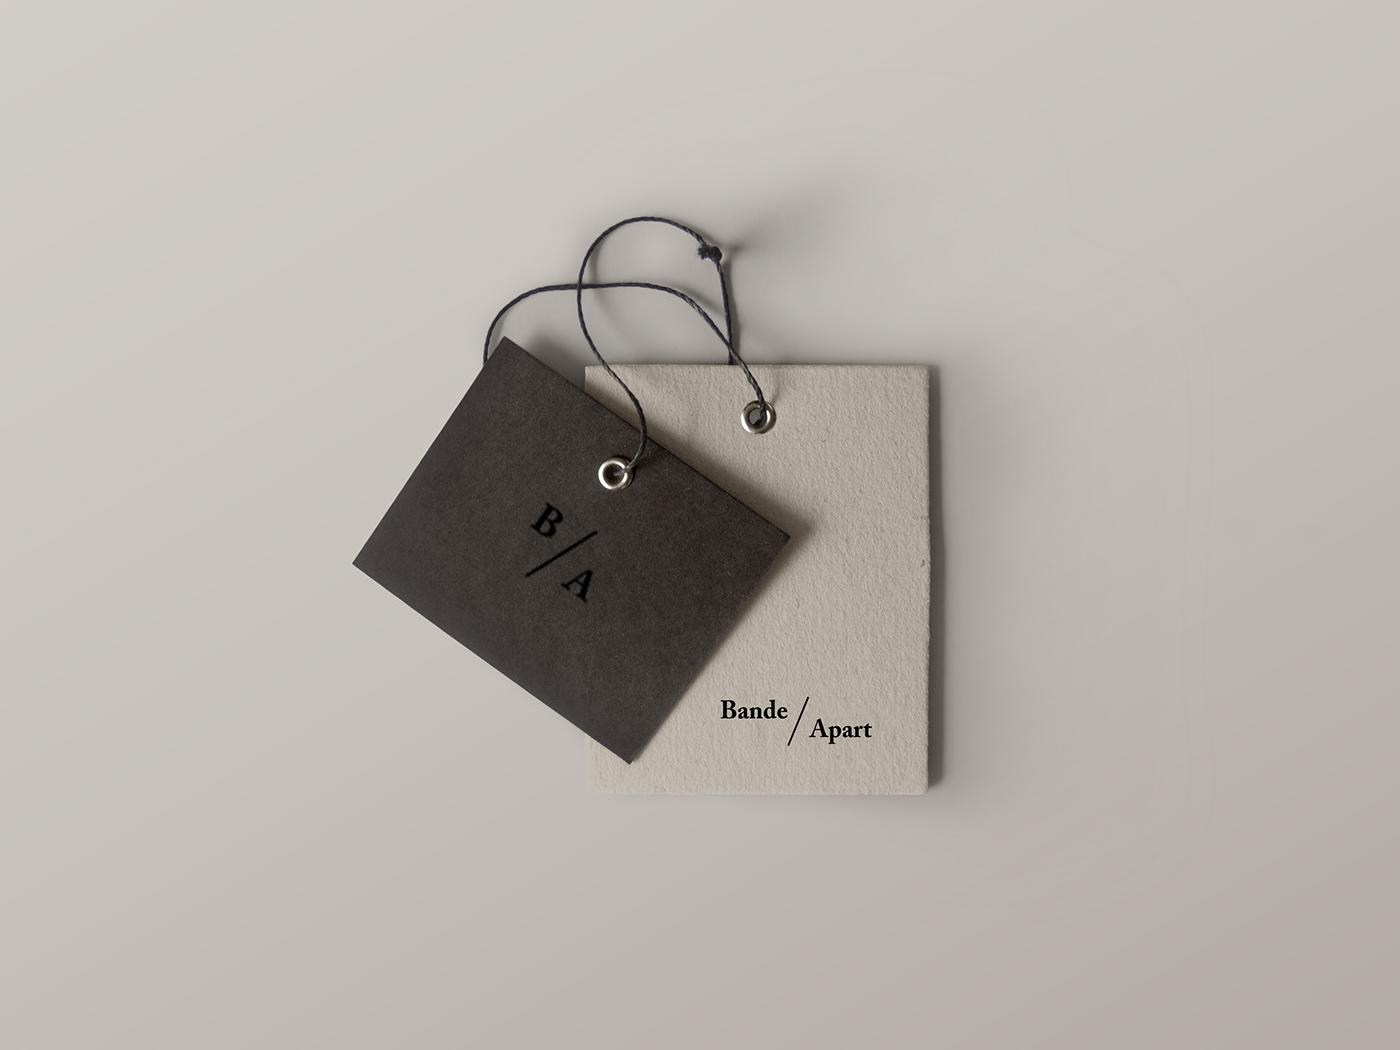 Bande / Apart design typography illustrator vector illustration logo branding